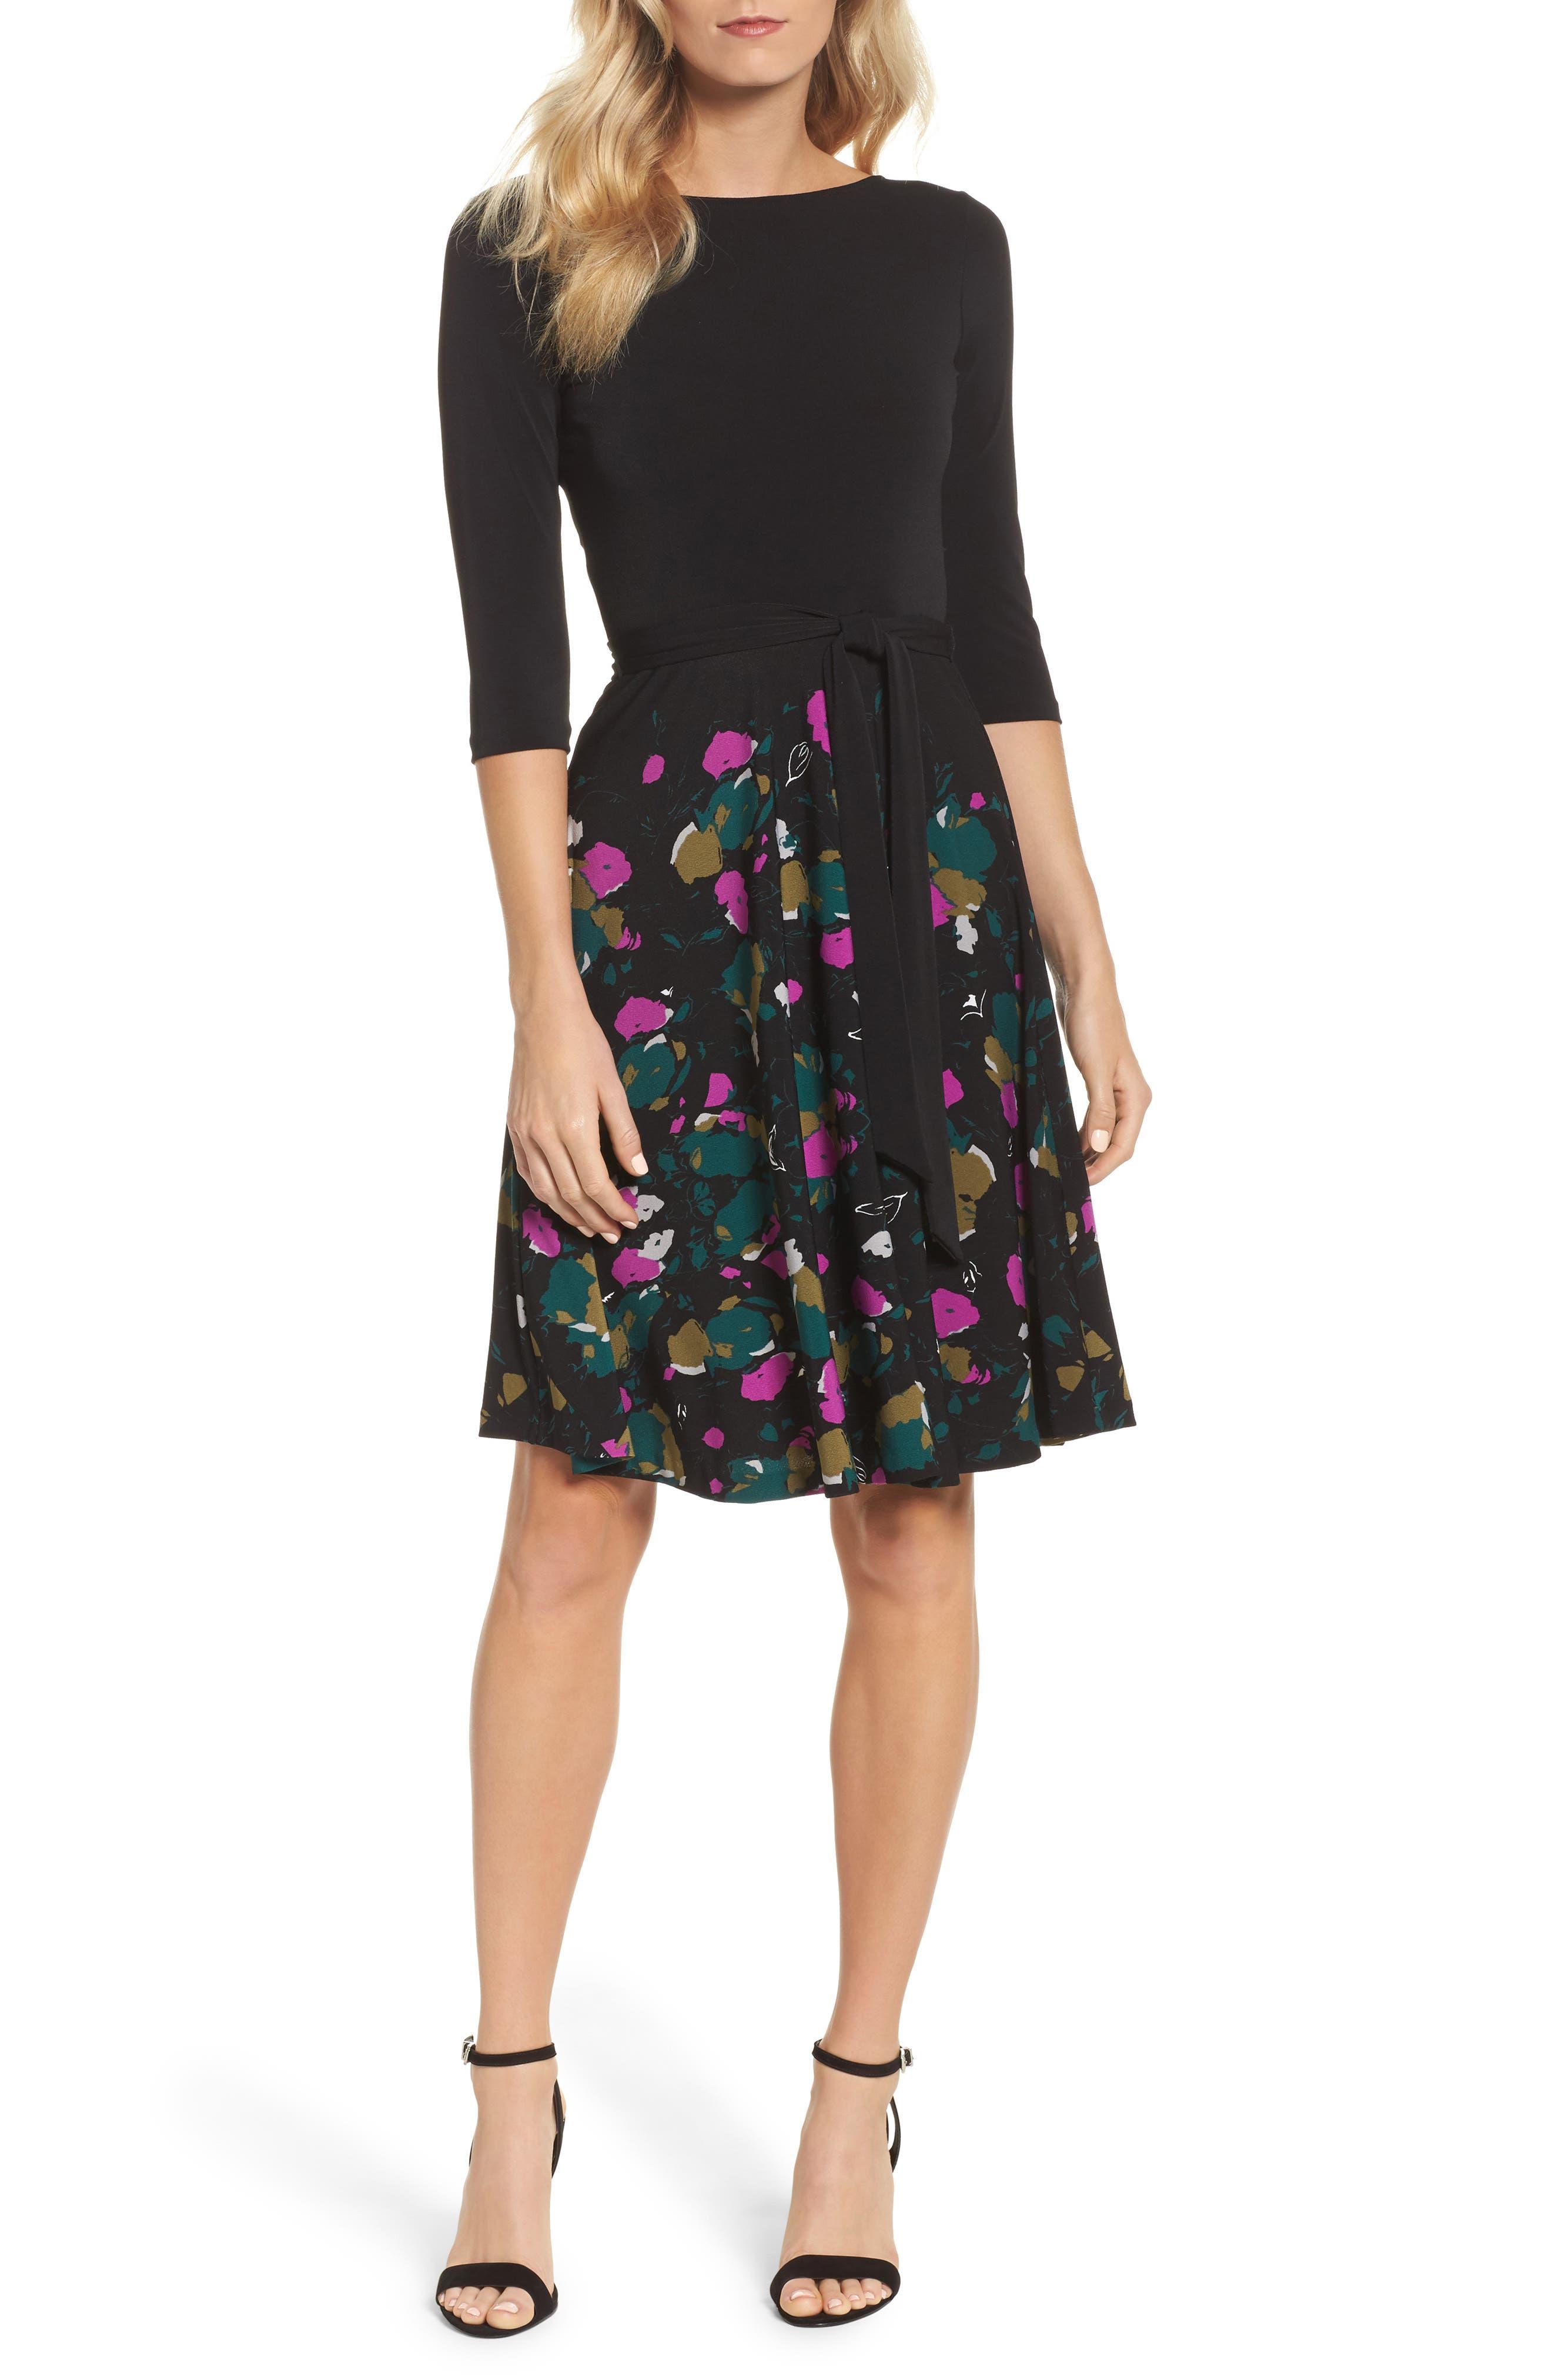 Leota Llana A-Line Dress